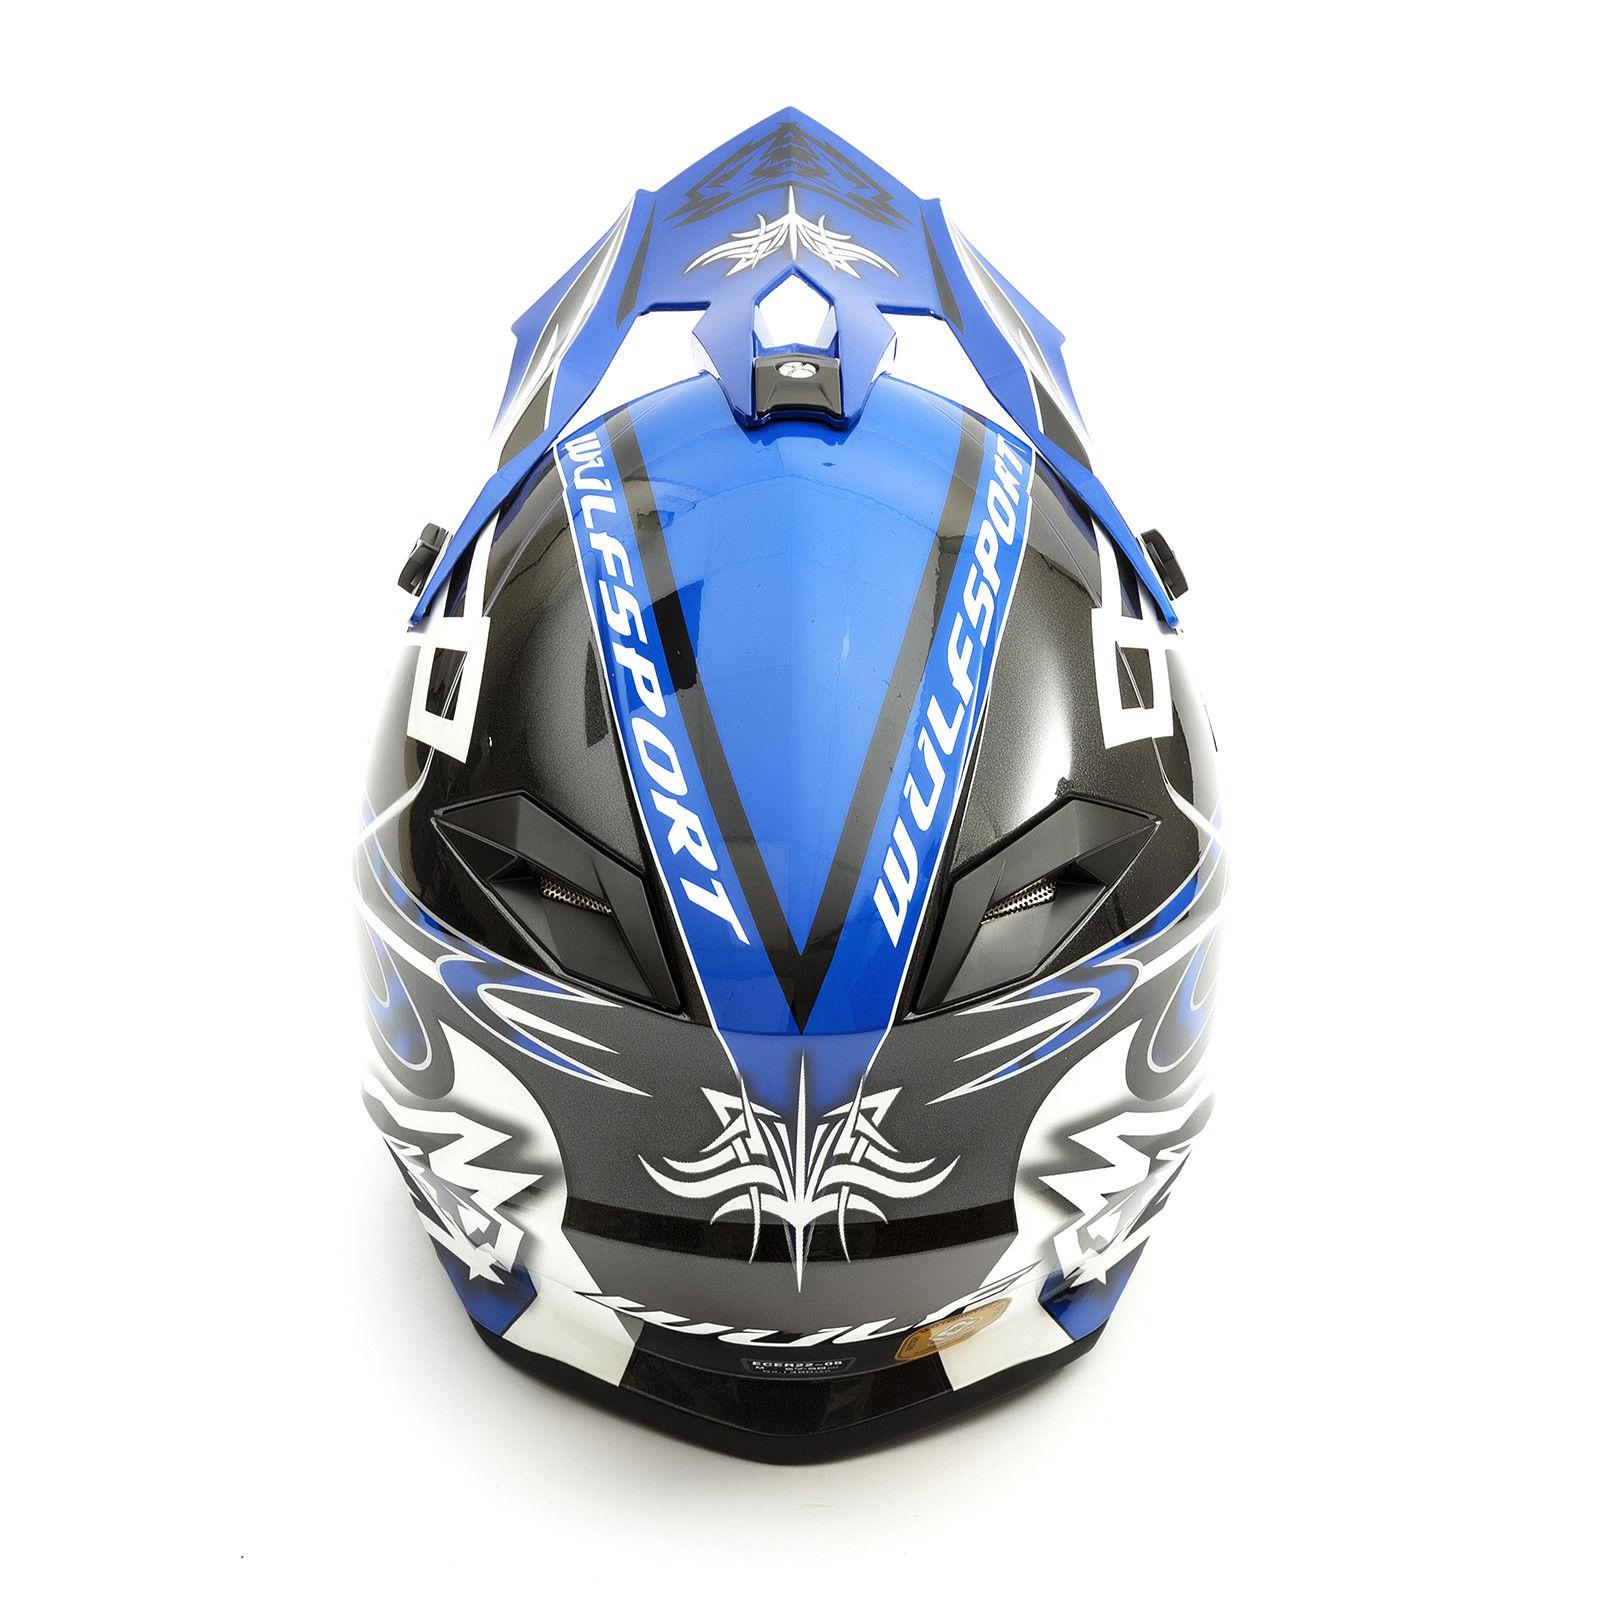 Wulfsport-Adult-Sceptre-Helmets-Motocross-Pitbike-Motorbike-Off-Road-Racing-ATV thumbnail 18